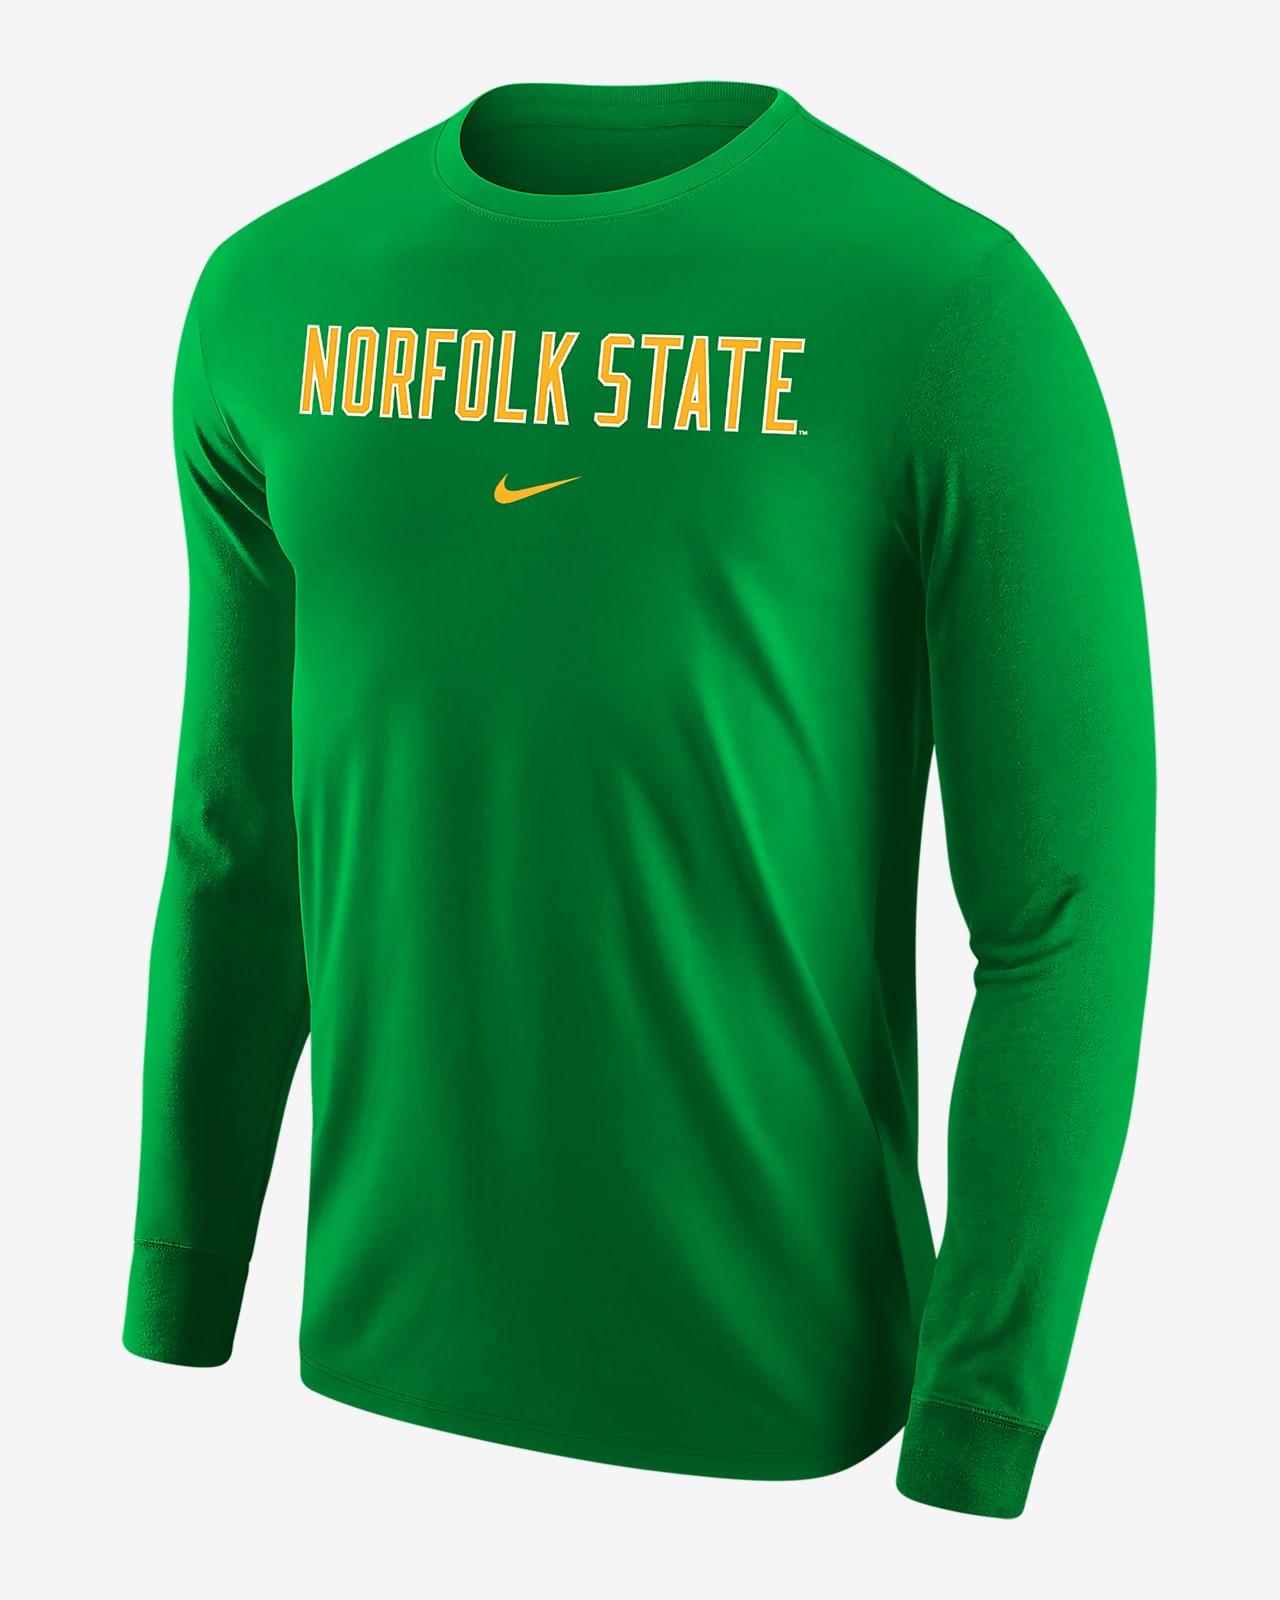 Nike College (Norfolk State) Men's Long-Sleeve T-Shirt